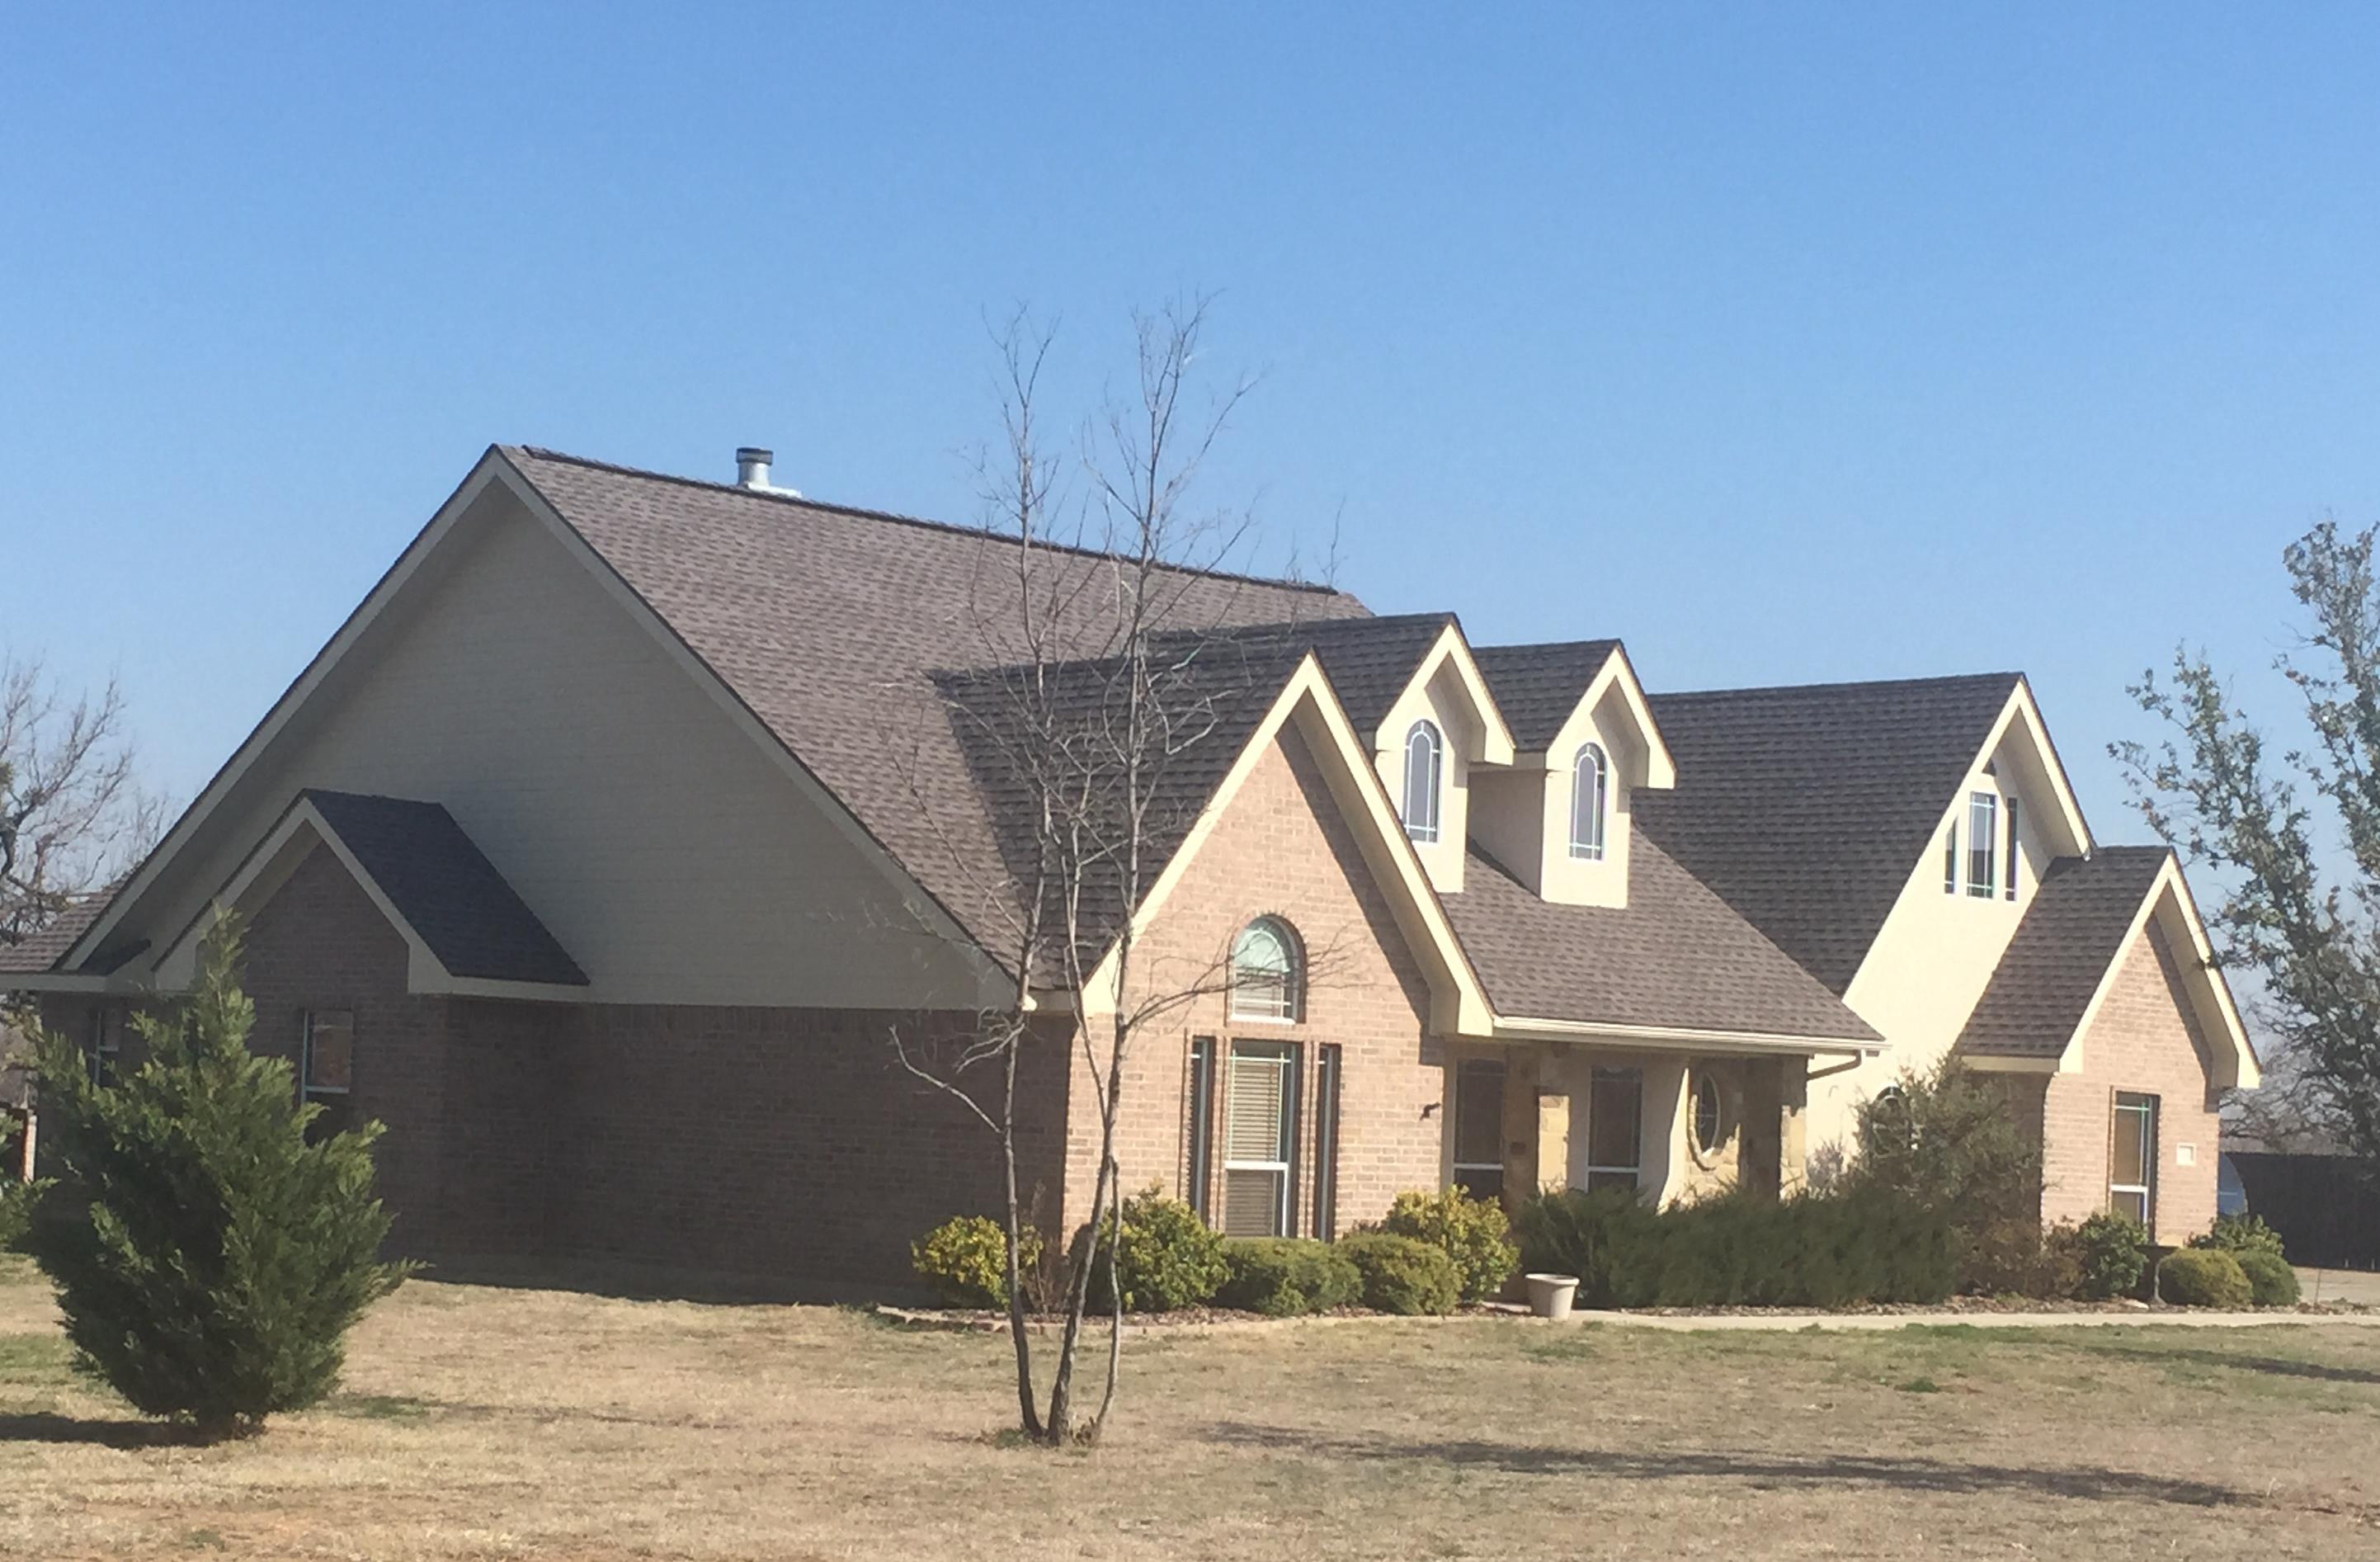 residential roofing company Abilene, TX